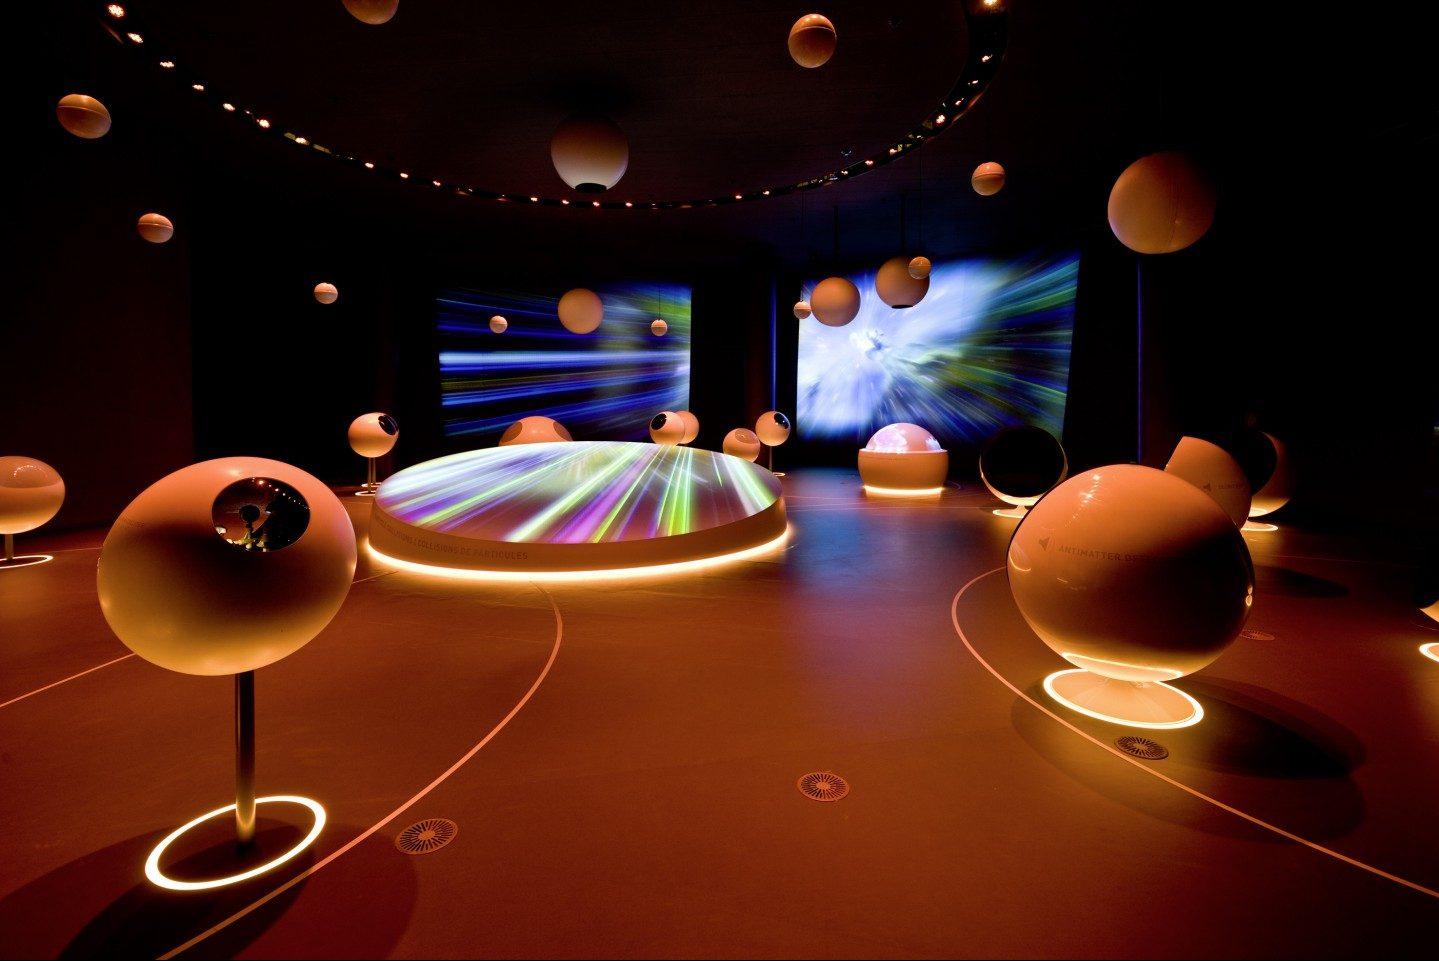 Switzerland, Geneva, CERN, physics,universe of particles permanent exhibition, school group travel, student travel © CERN, Michael Jungblut